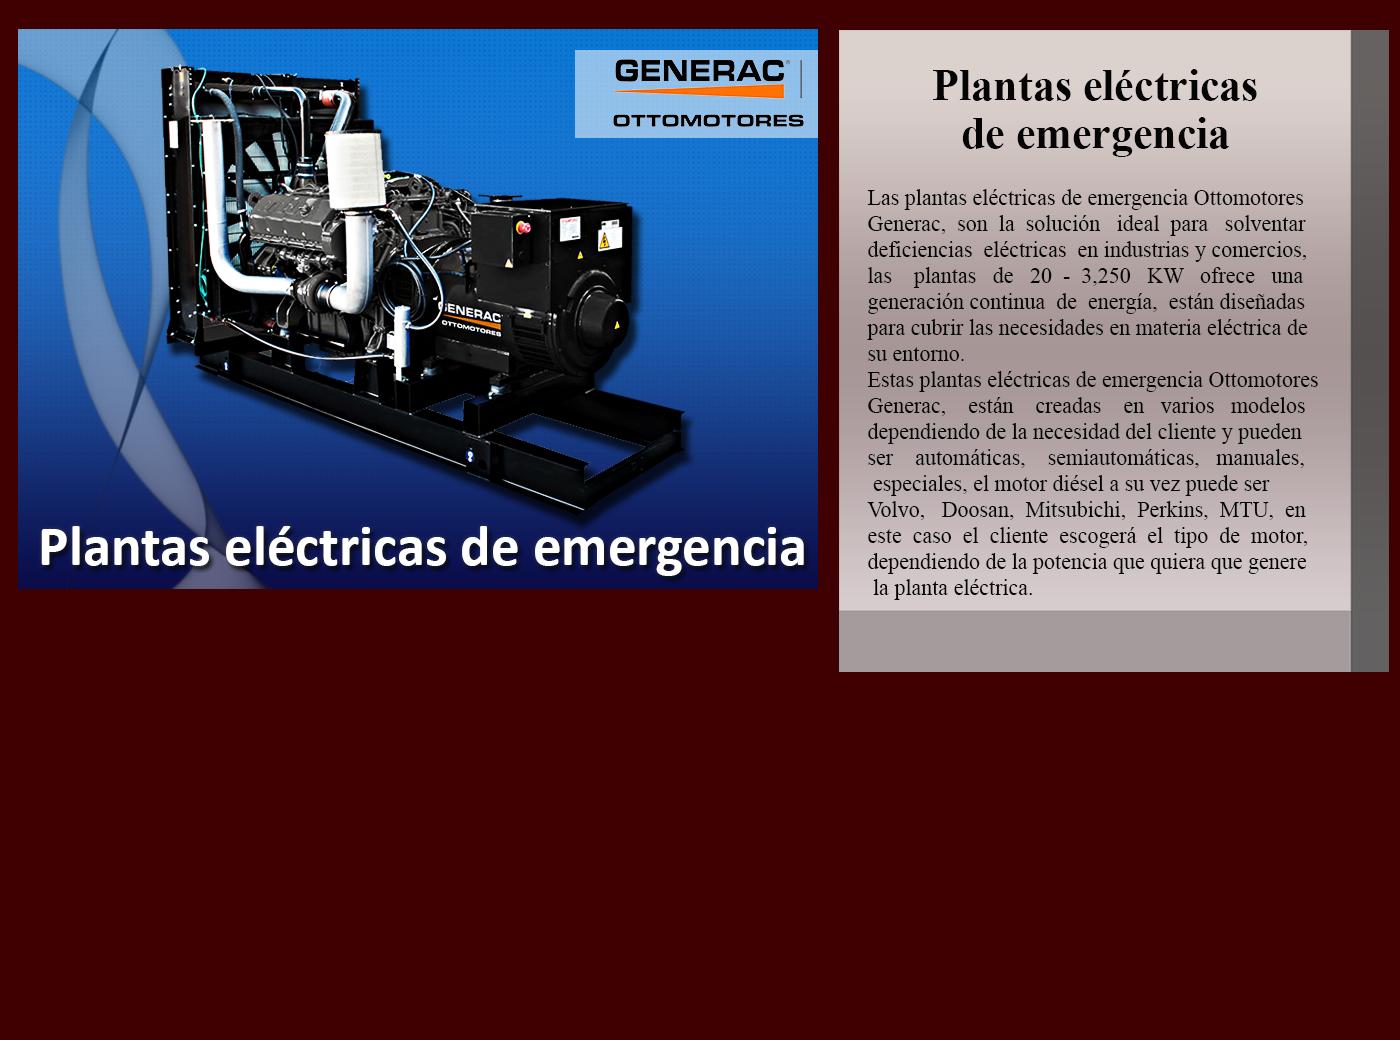 PLANTAS_ELÉCTRICAS_DE_EMERGENCIA